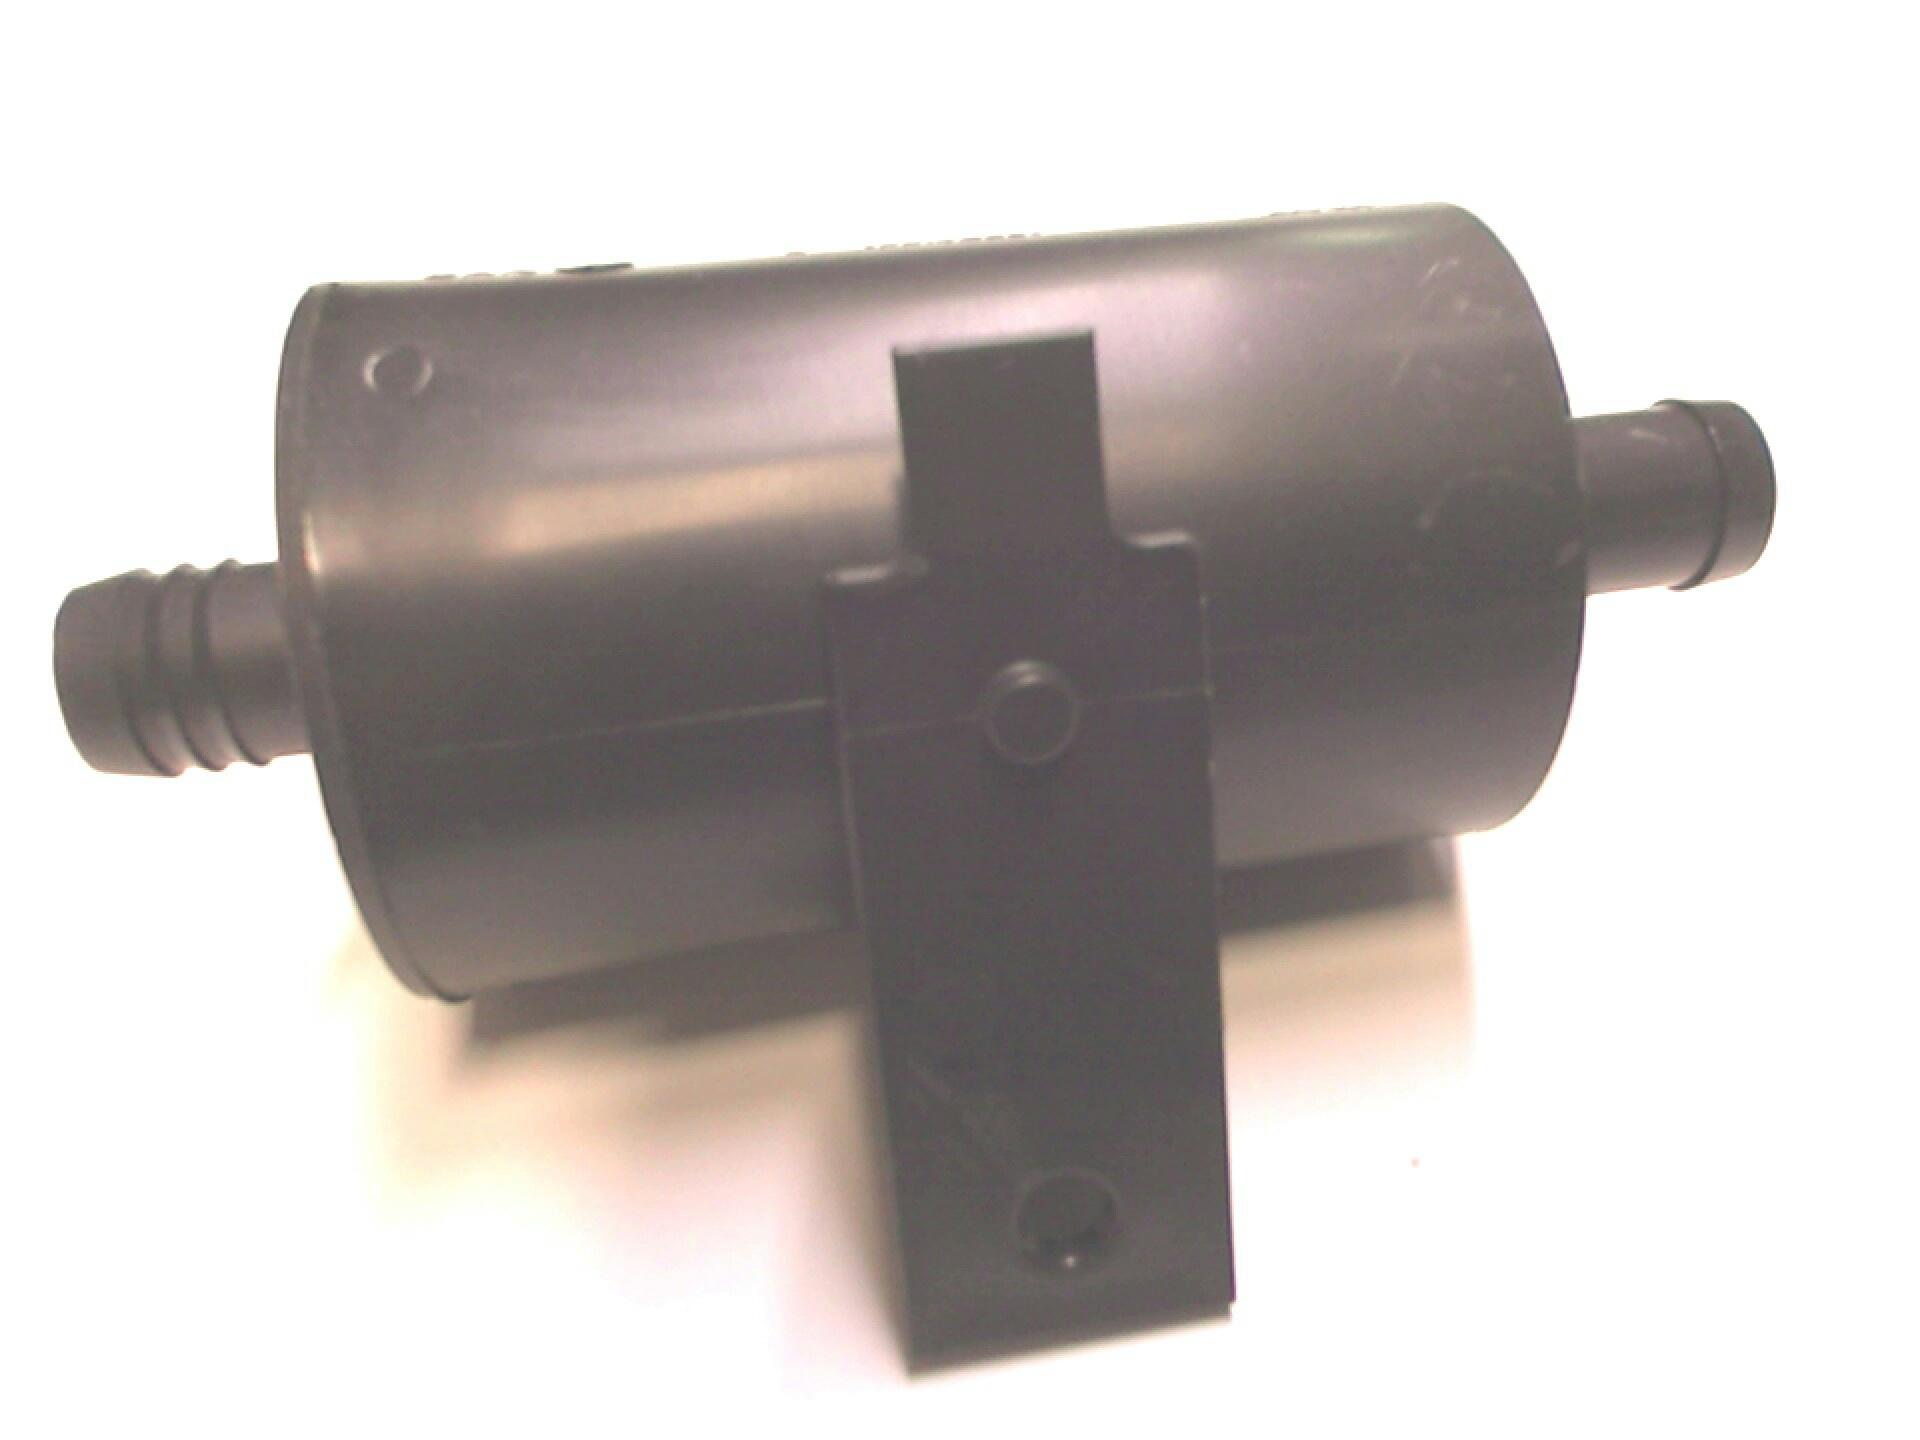 a_20151008_1330356703 search jeep grand cherokee emissions \u003e vacuum canister leak Evap Leak Detection Pump at soozxer.org